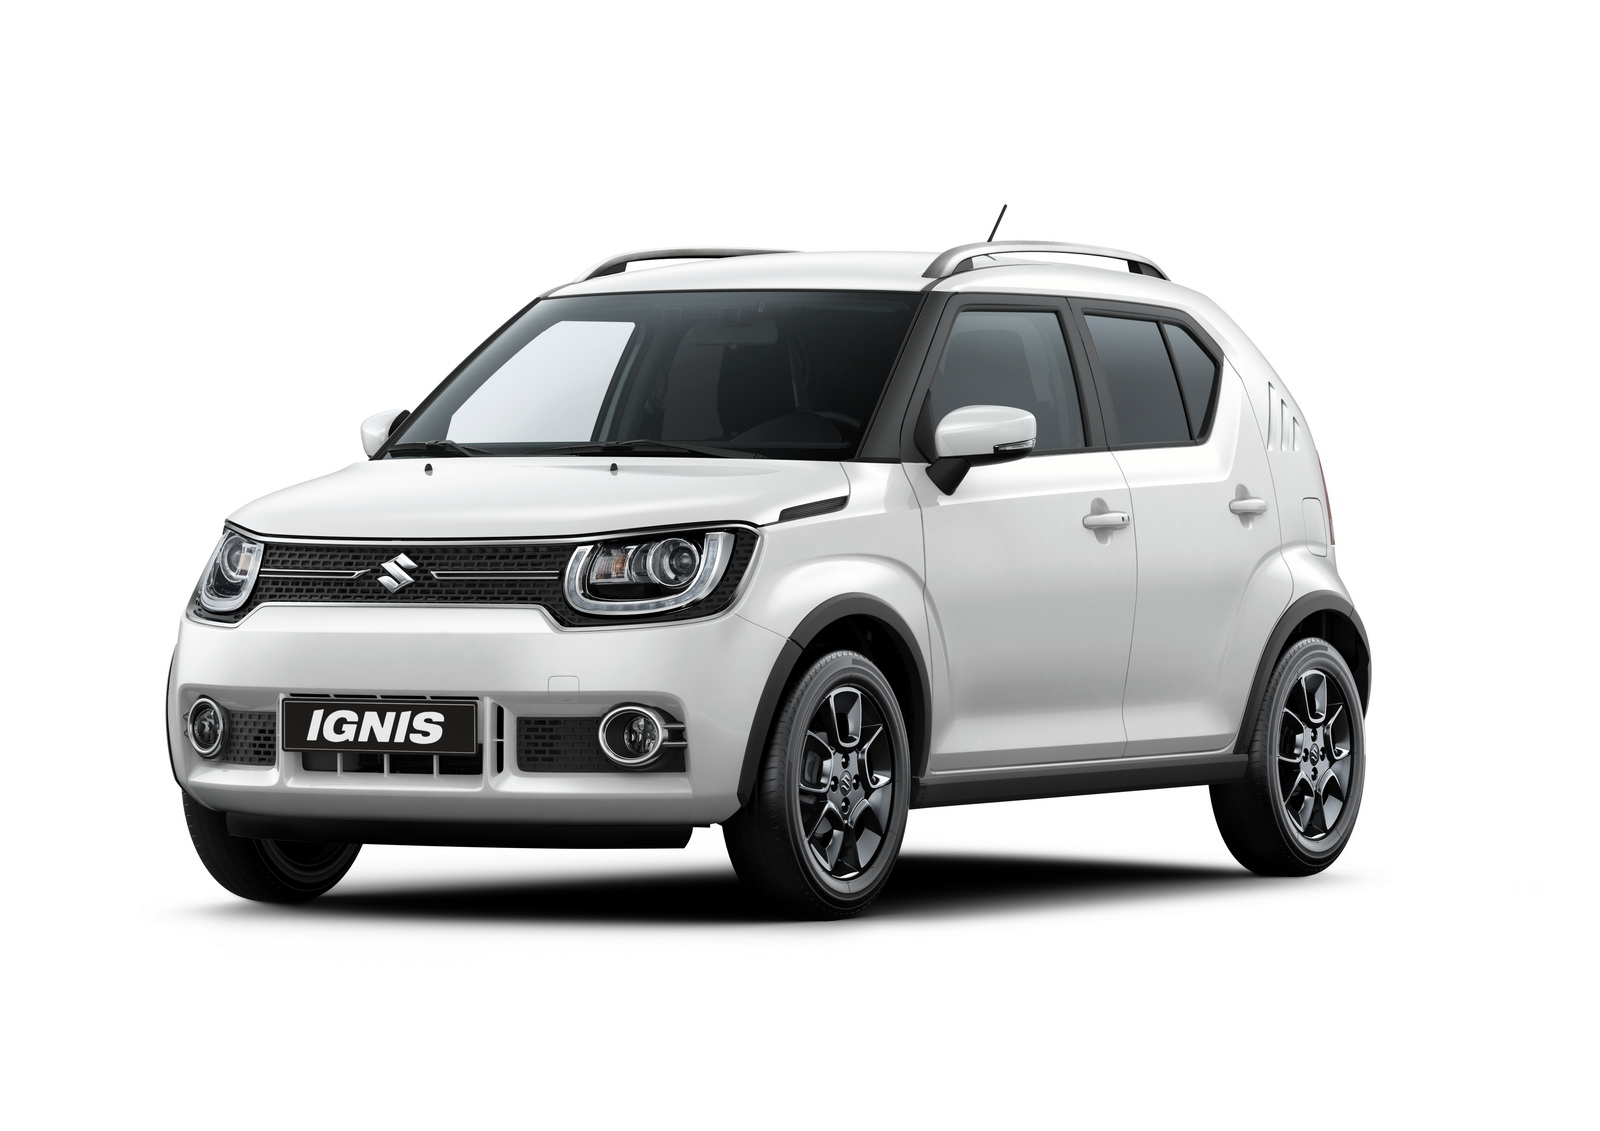 2017 SuzukiIgnis 01 - Daftar harga Pricelist mobil Suzuki 2017